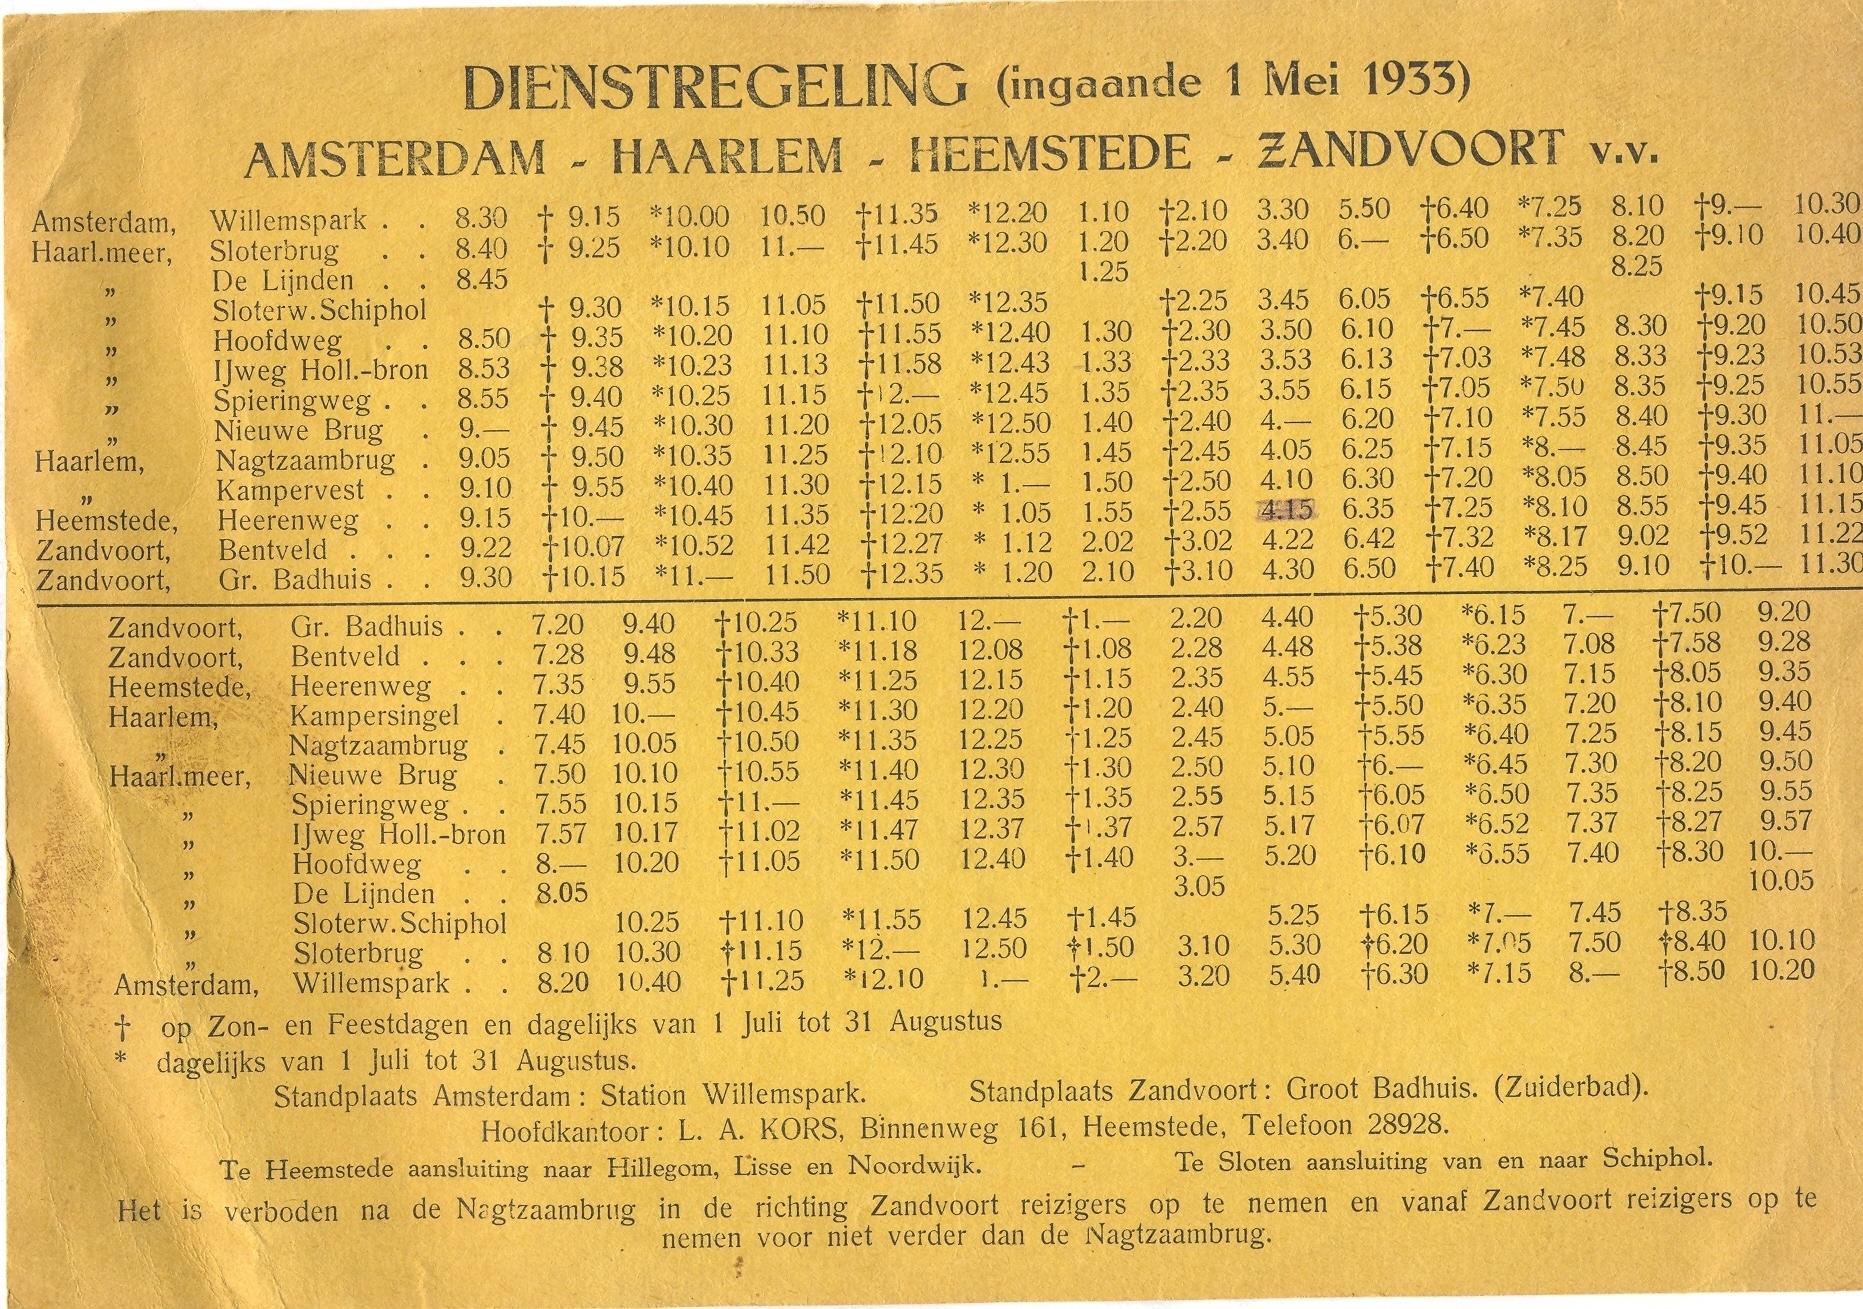 dienstregeling-1933